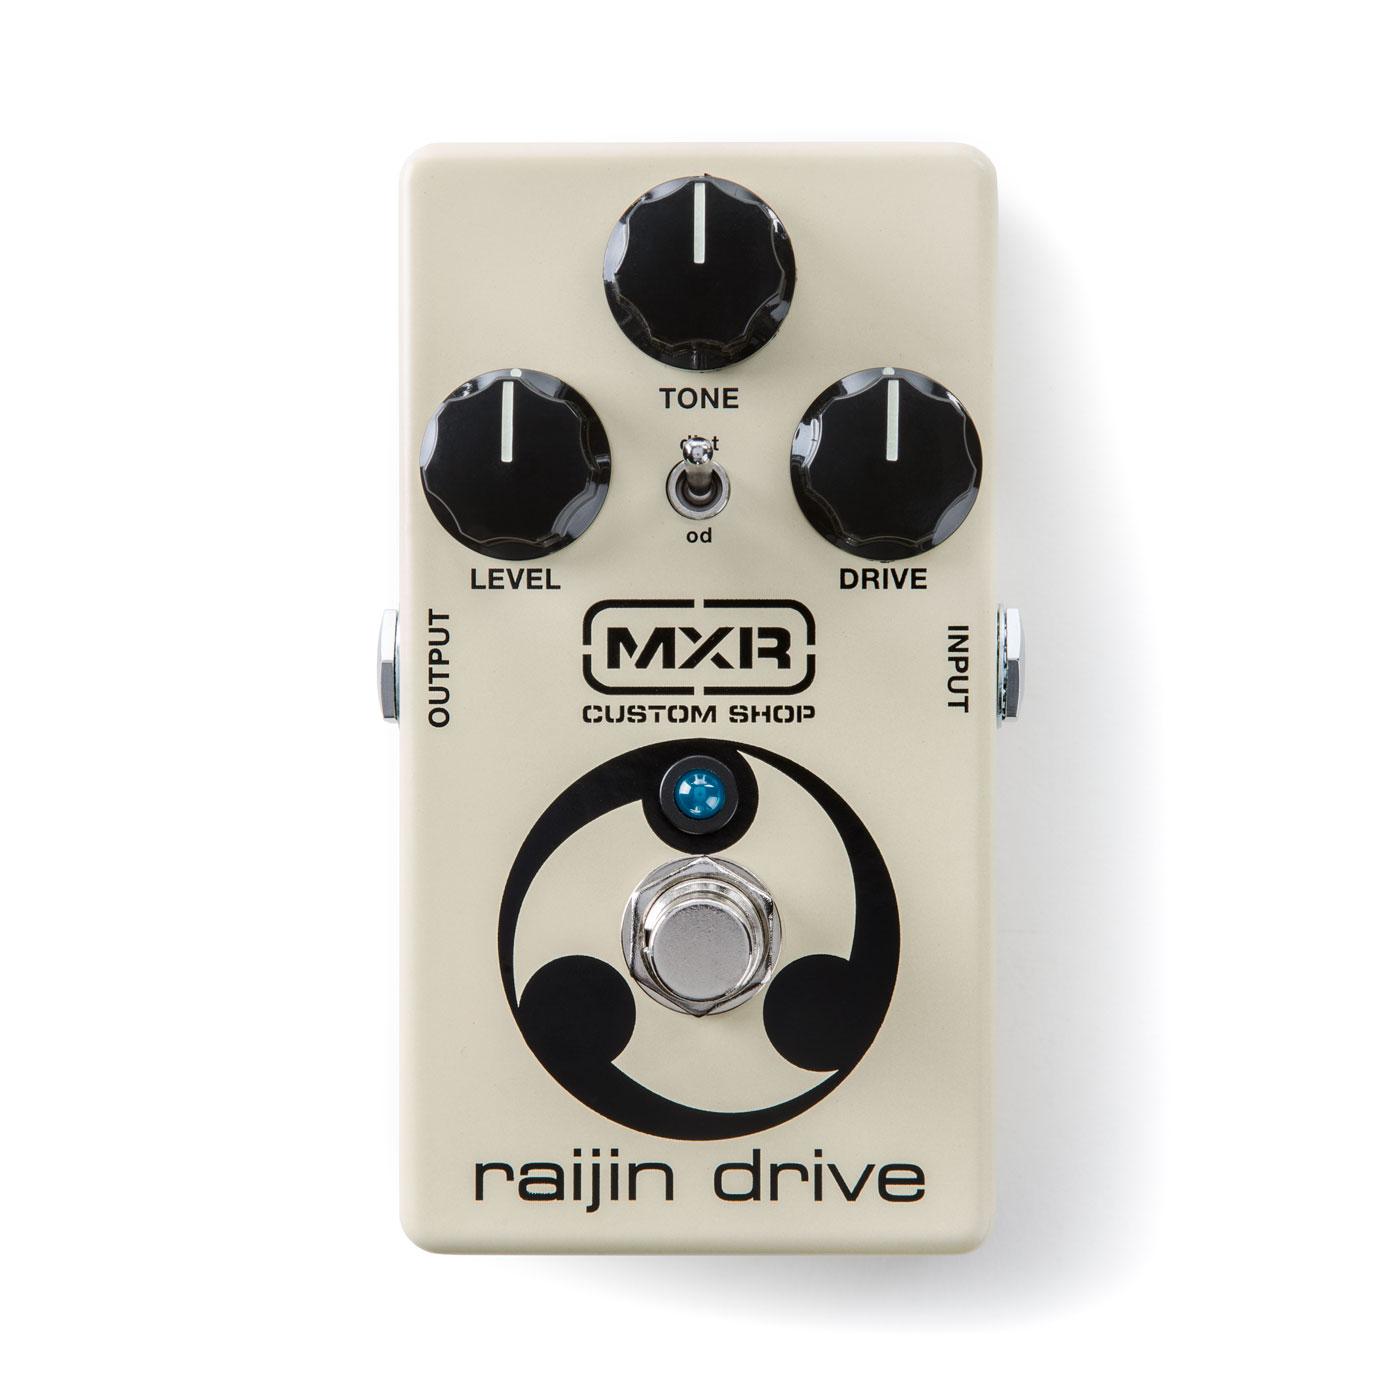 mxr evh 5150 overdrive pedal gear music canada 39 s best online music store. Black Bedroom Furniture Sets. Home Design Ideas